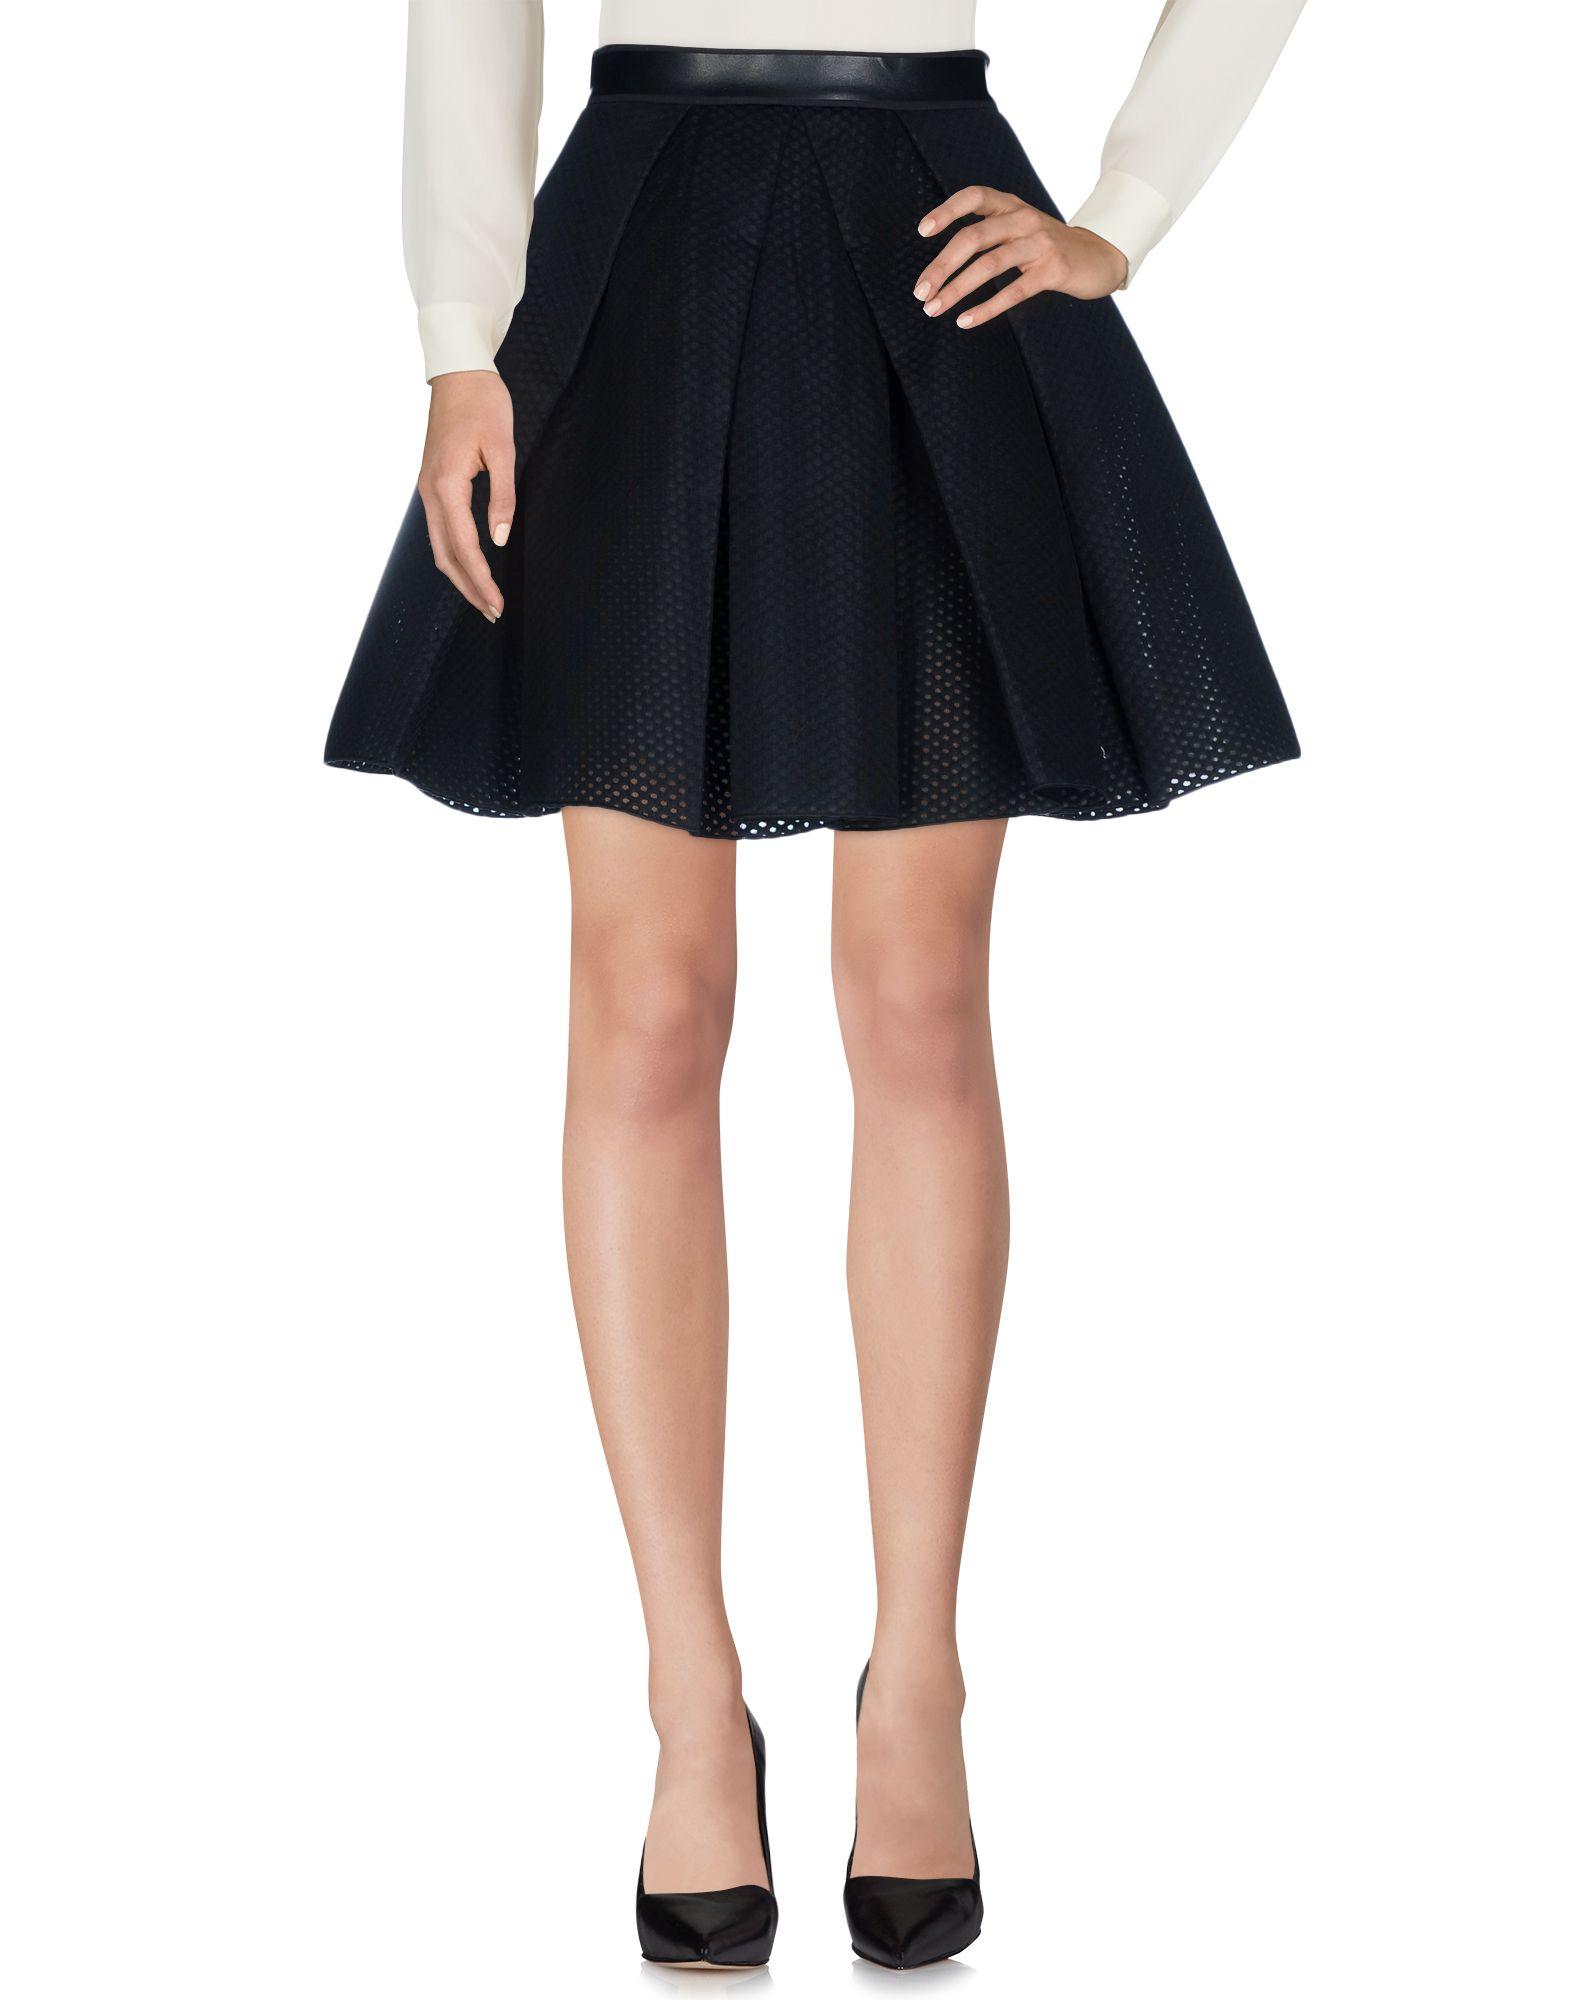 MANUEL FACCHINI Knee Length Skirts in Black